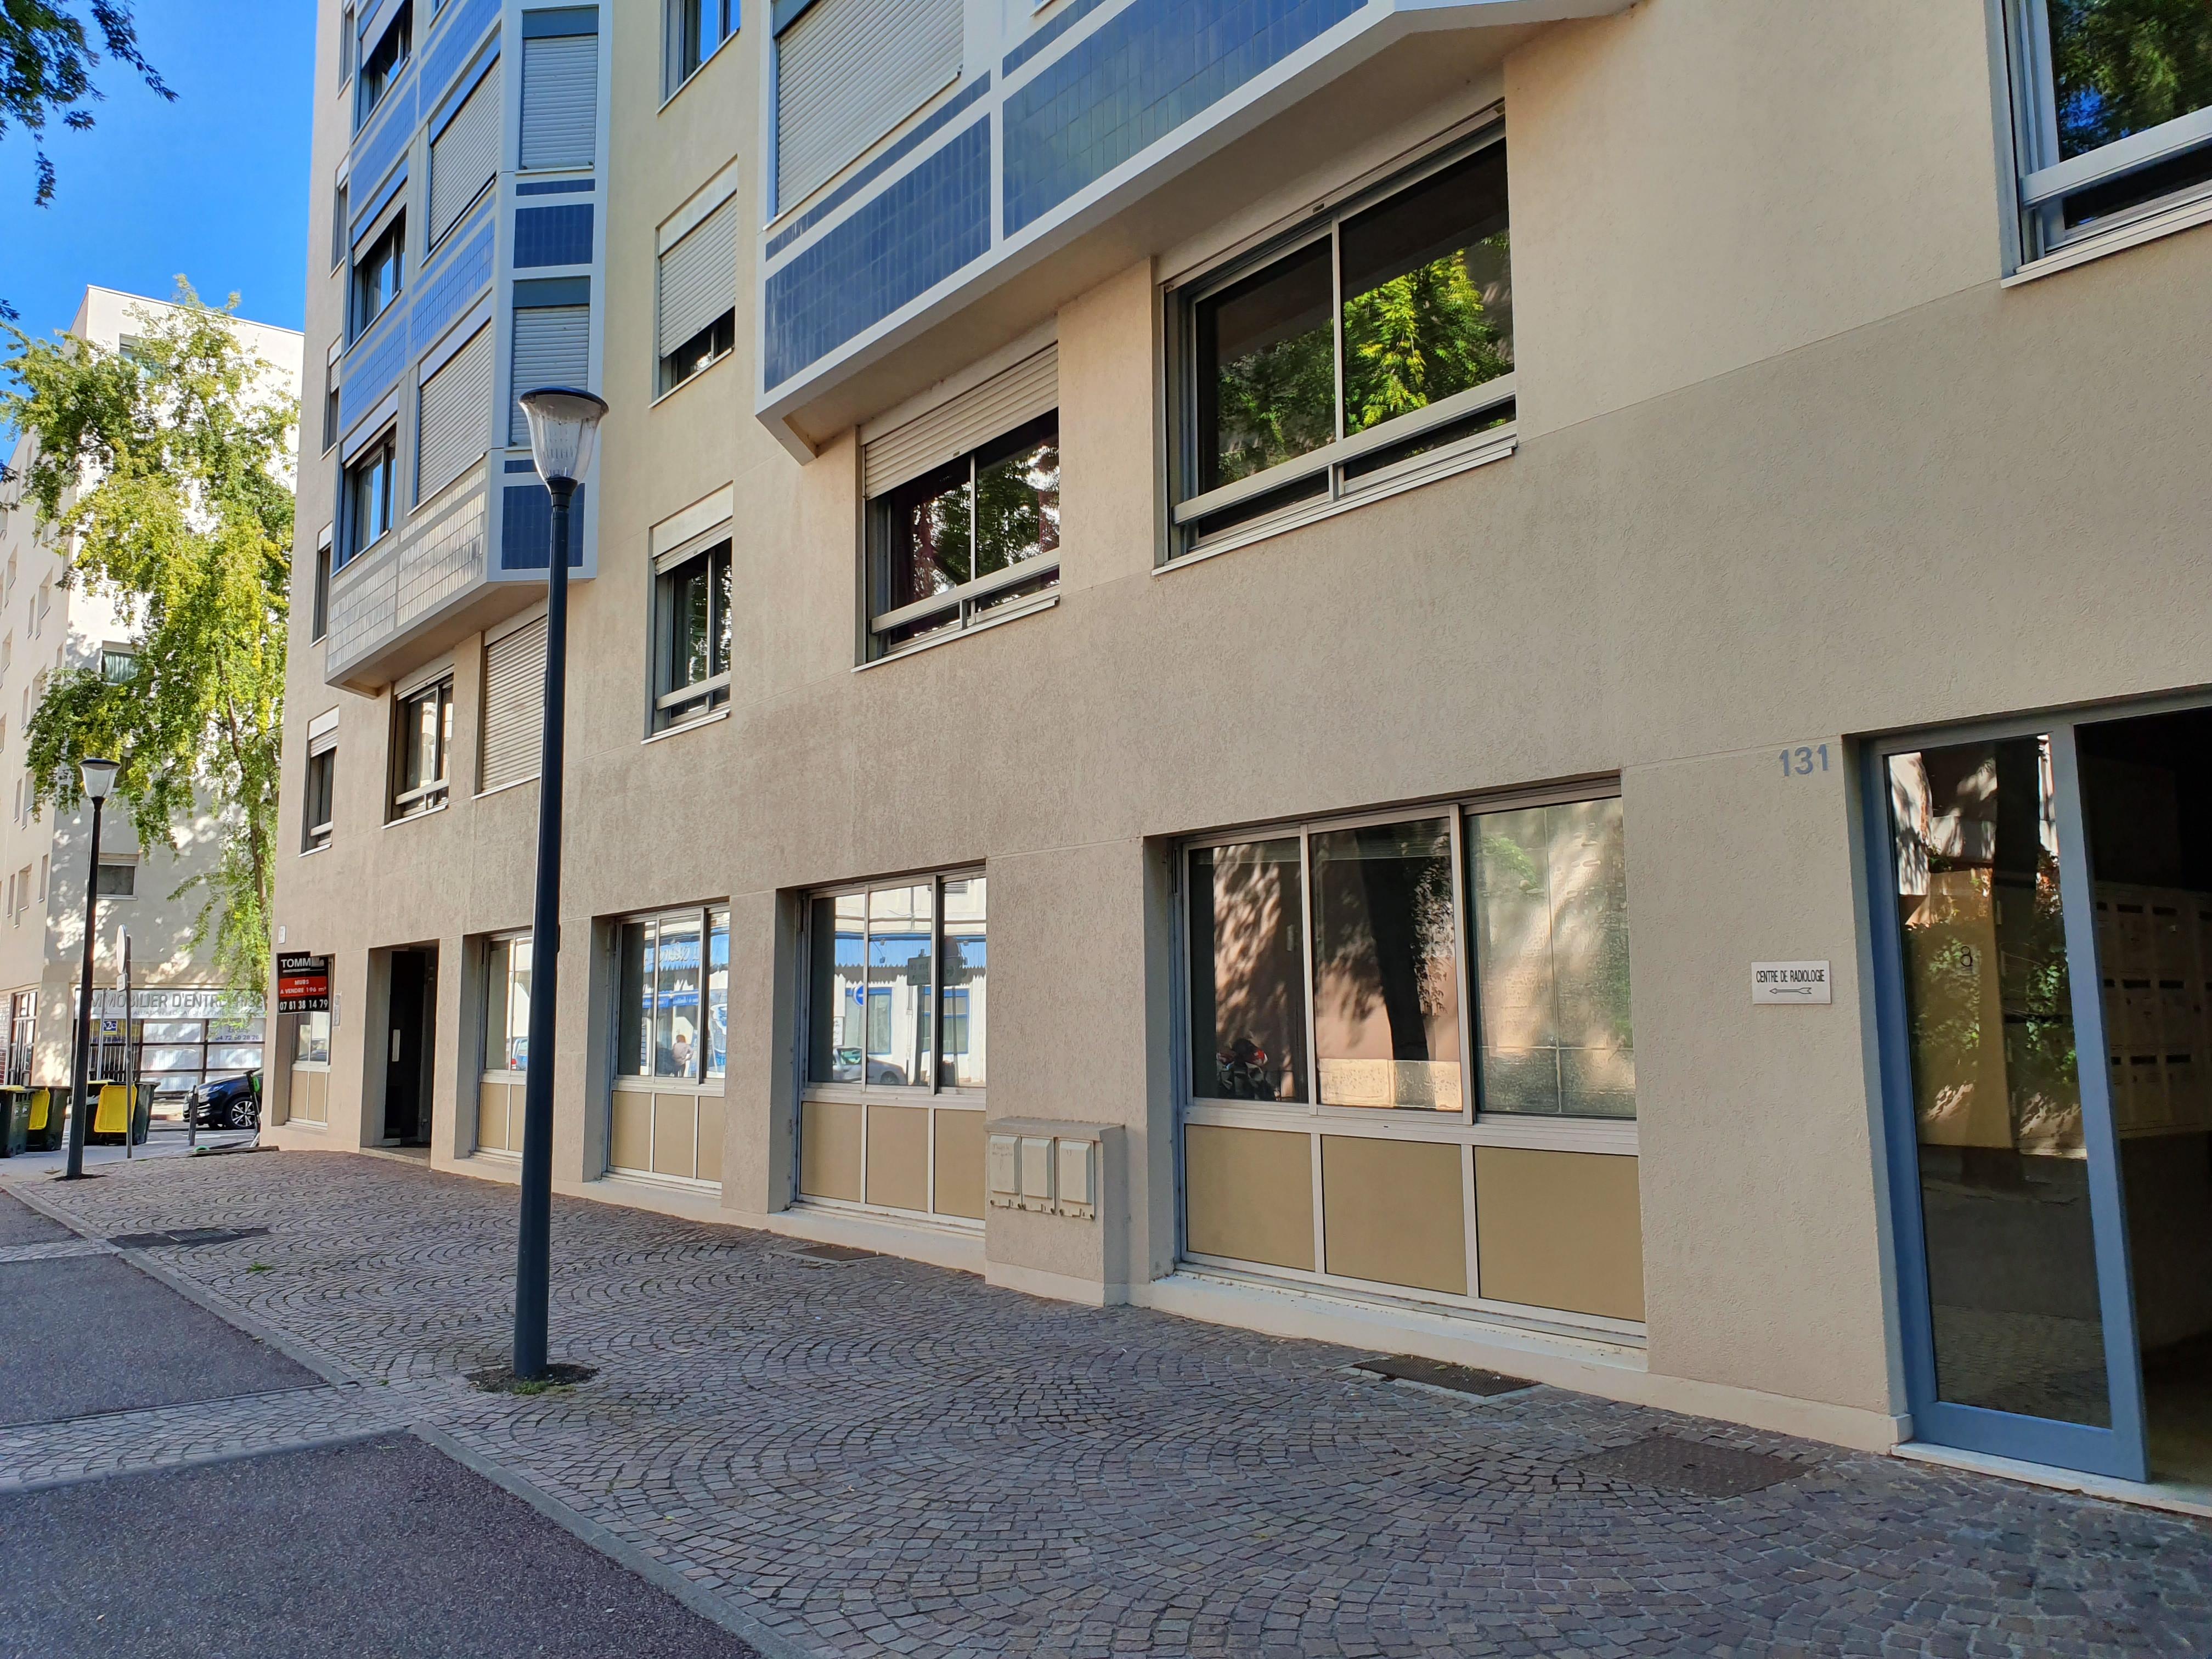 LYON 6 – Rue Vauban – Secteur Garibaldi-Vendôme – A VENDRE BUREAUX LIBRES